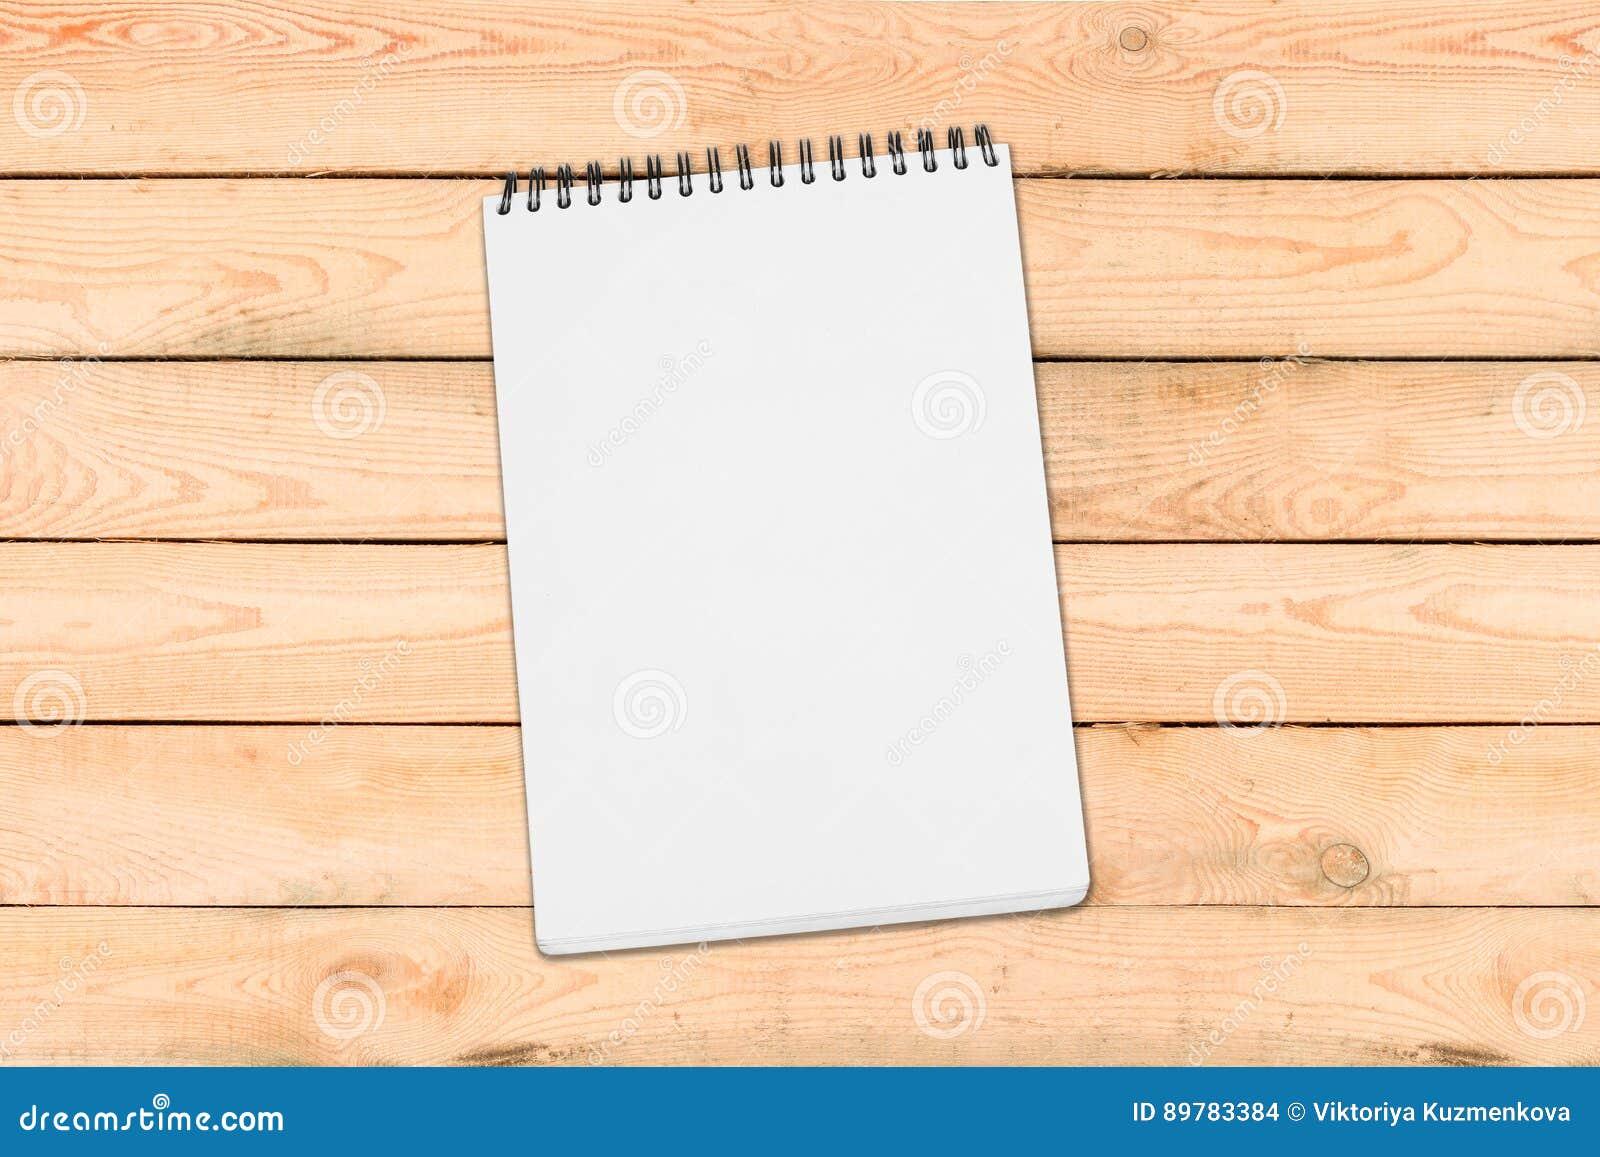 Dibujo Dibujo marcador bleedproof Cojín de papel-en espiral 50 Hojas 75gsm